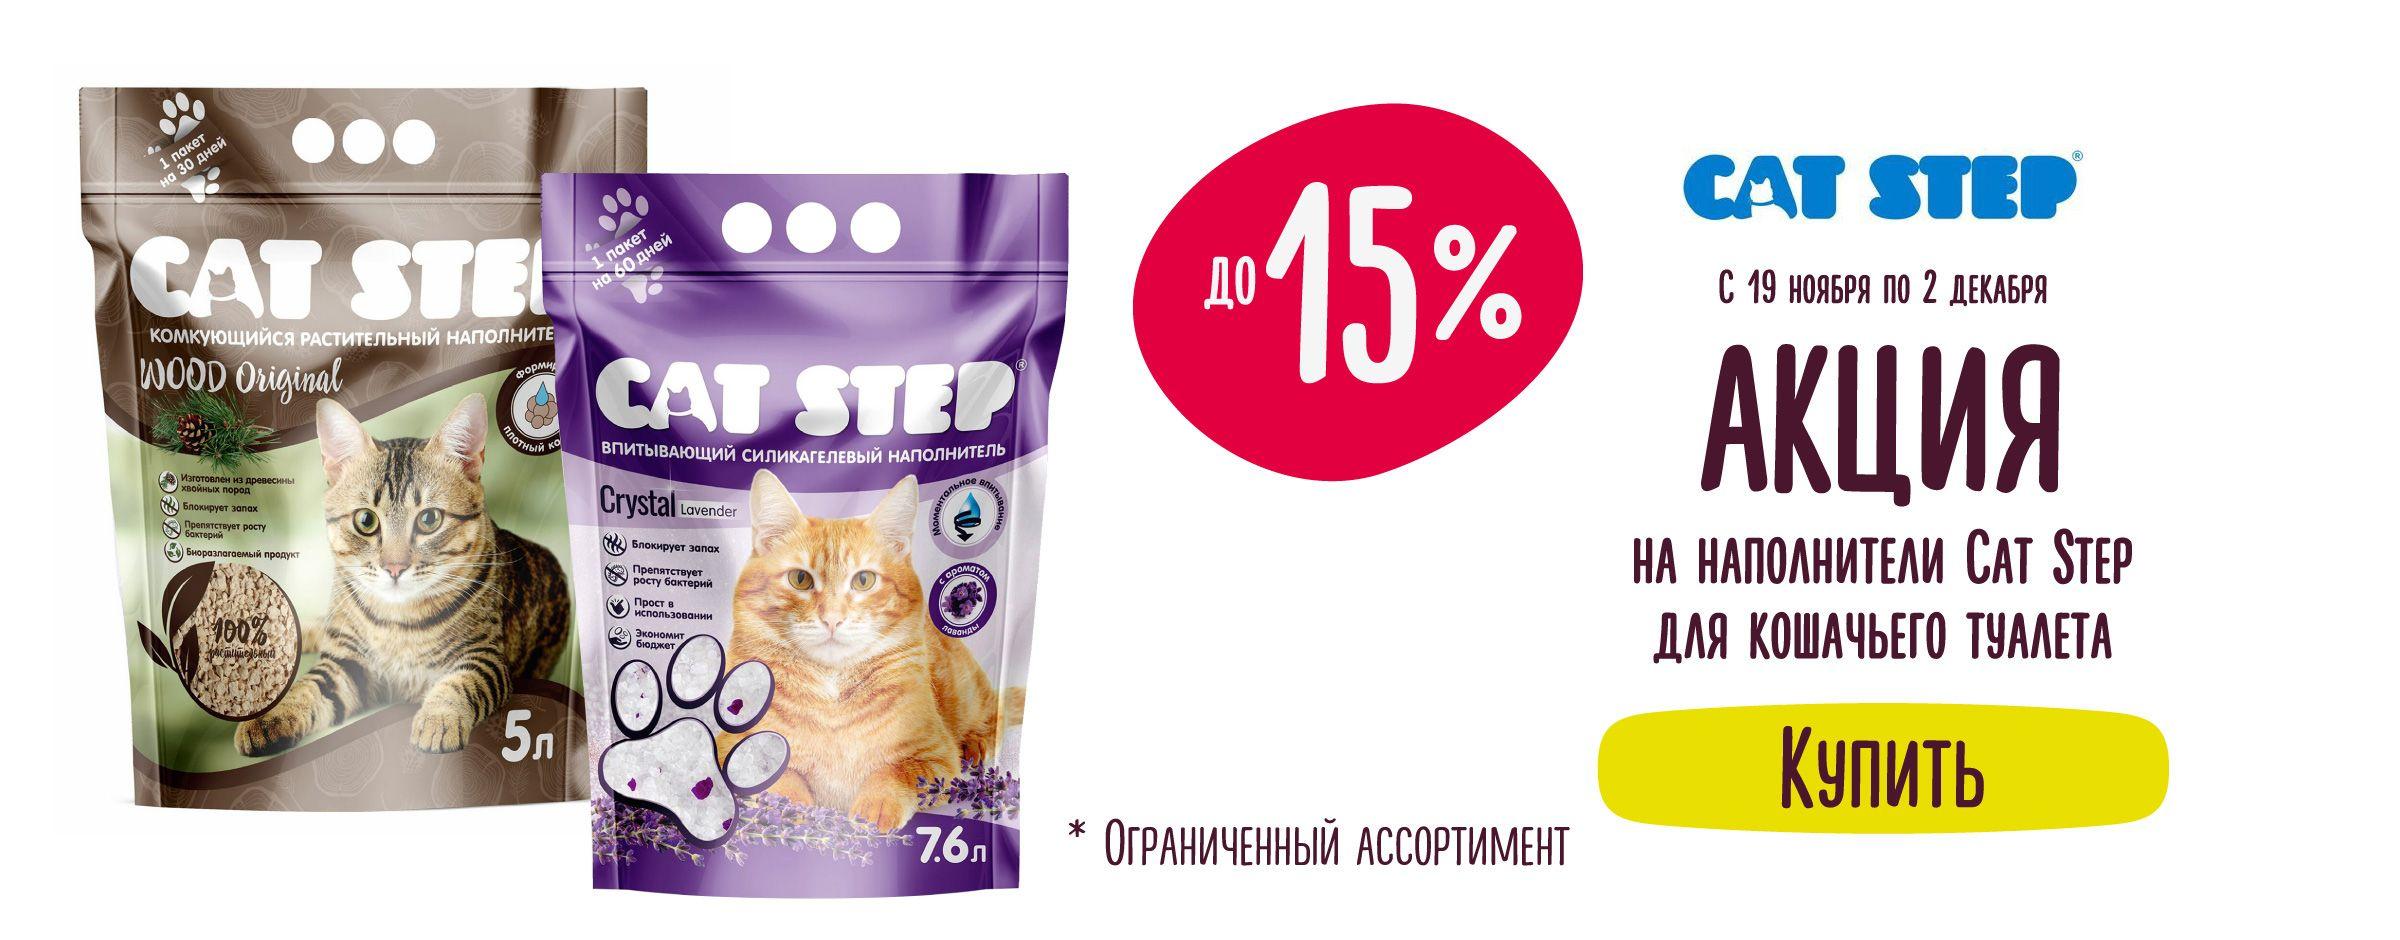 Скидка до 15% на наполнители Cat Step для кошачьего туалета == Листовка23